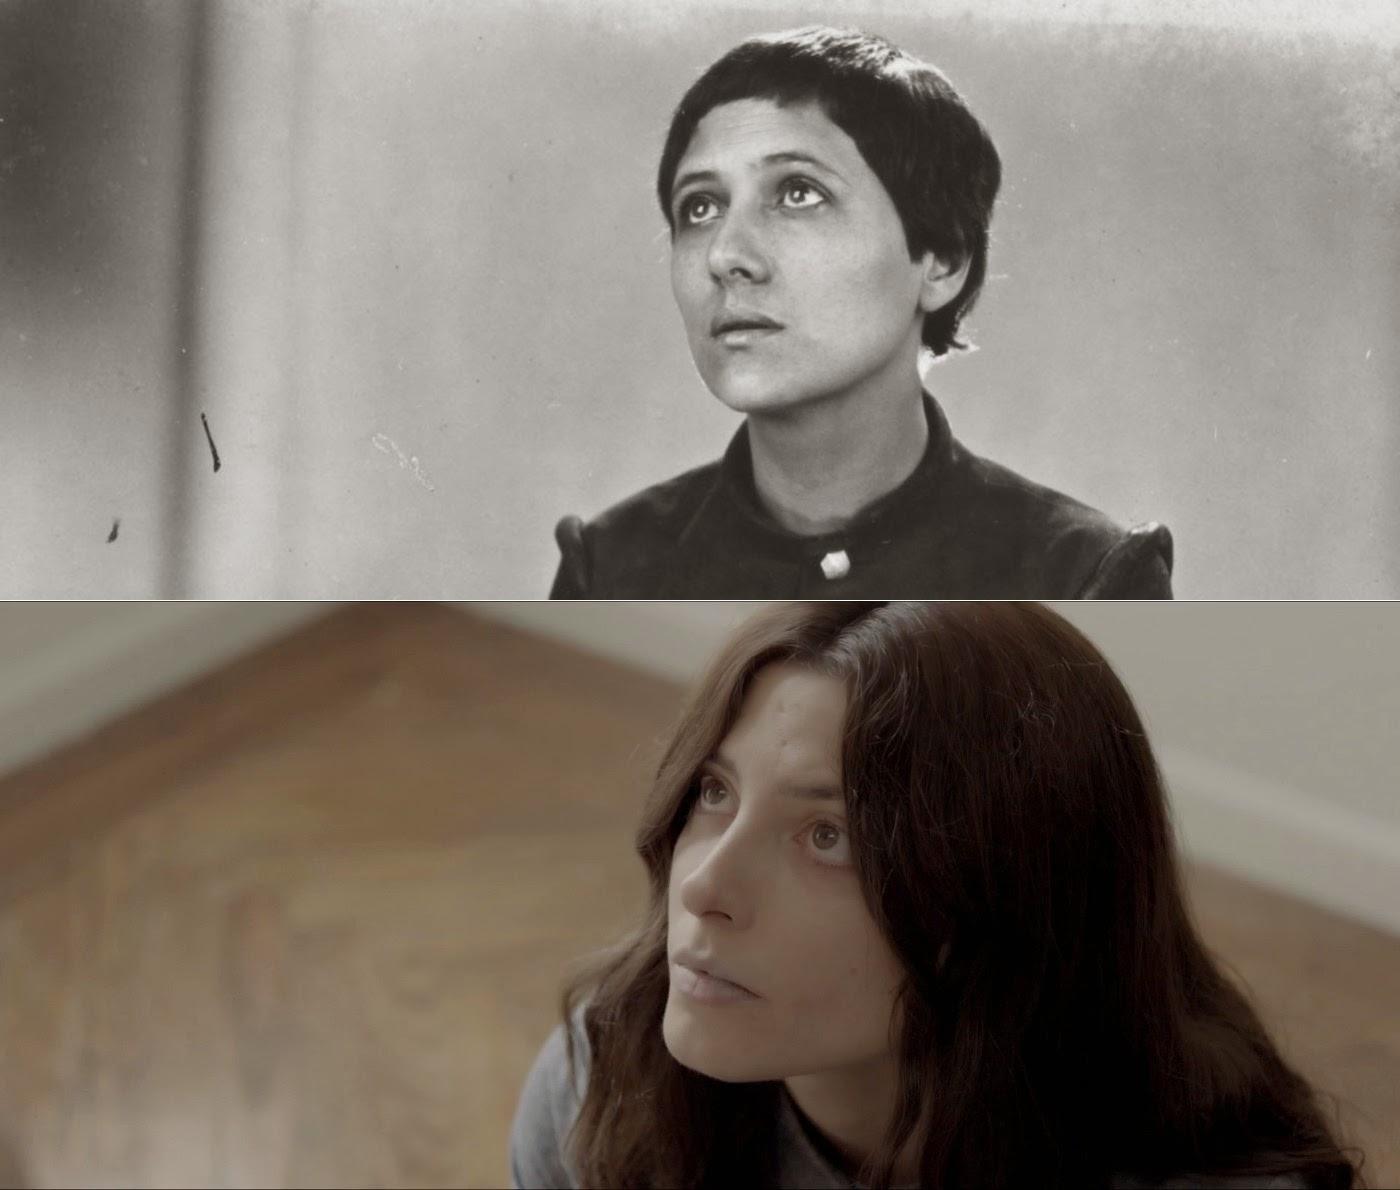 Renée Falconetti, La passion de Jeanne D'Arc, Carl Theodor Dreyer; Bárbara Lennie, Magical Girl, Carlos Vermut